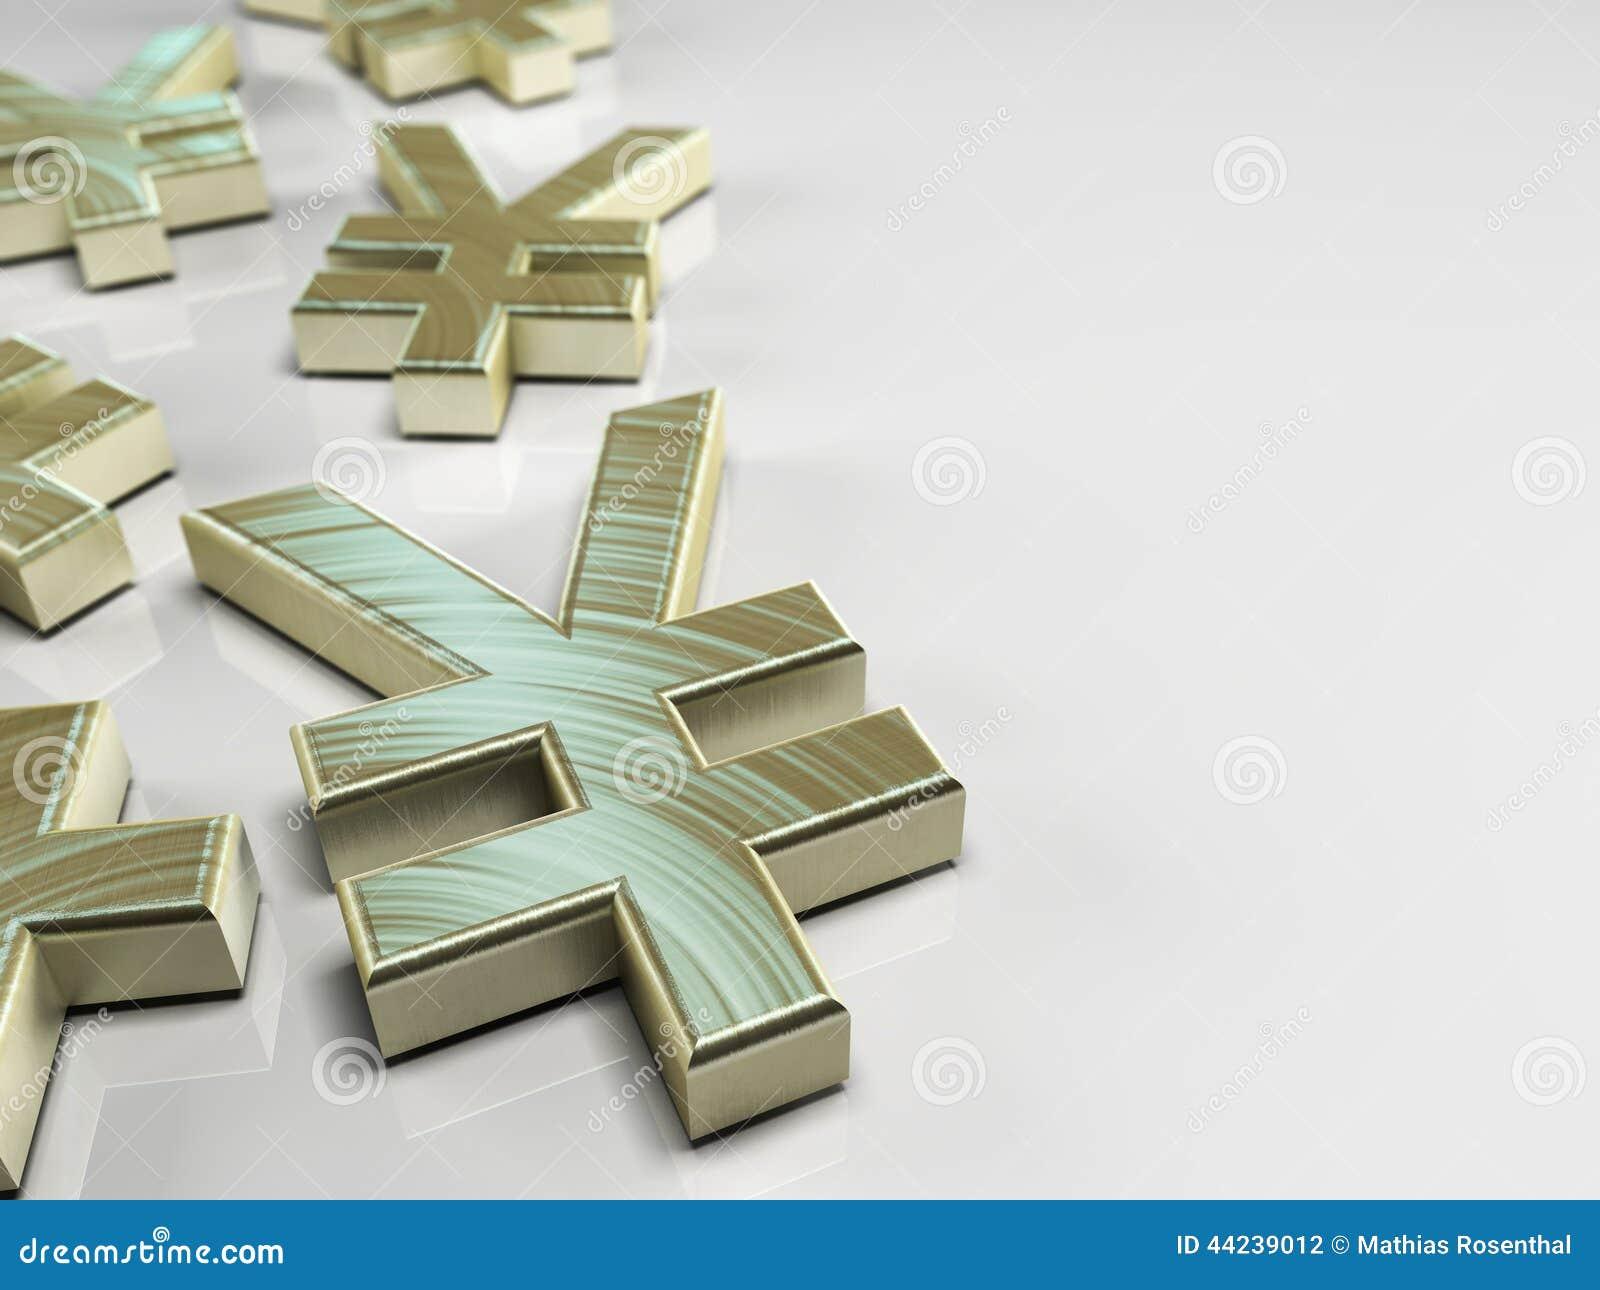 Japanese yen symbol stock illustration illustration of japanese yen symbol biocorpaavc Choice Image